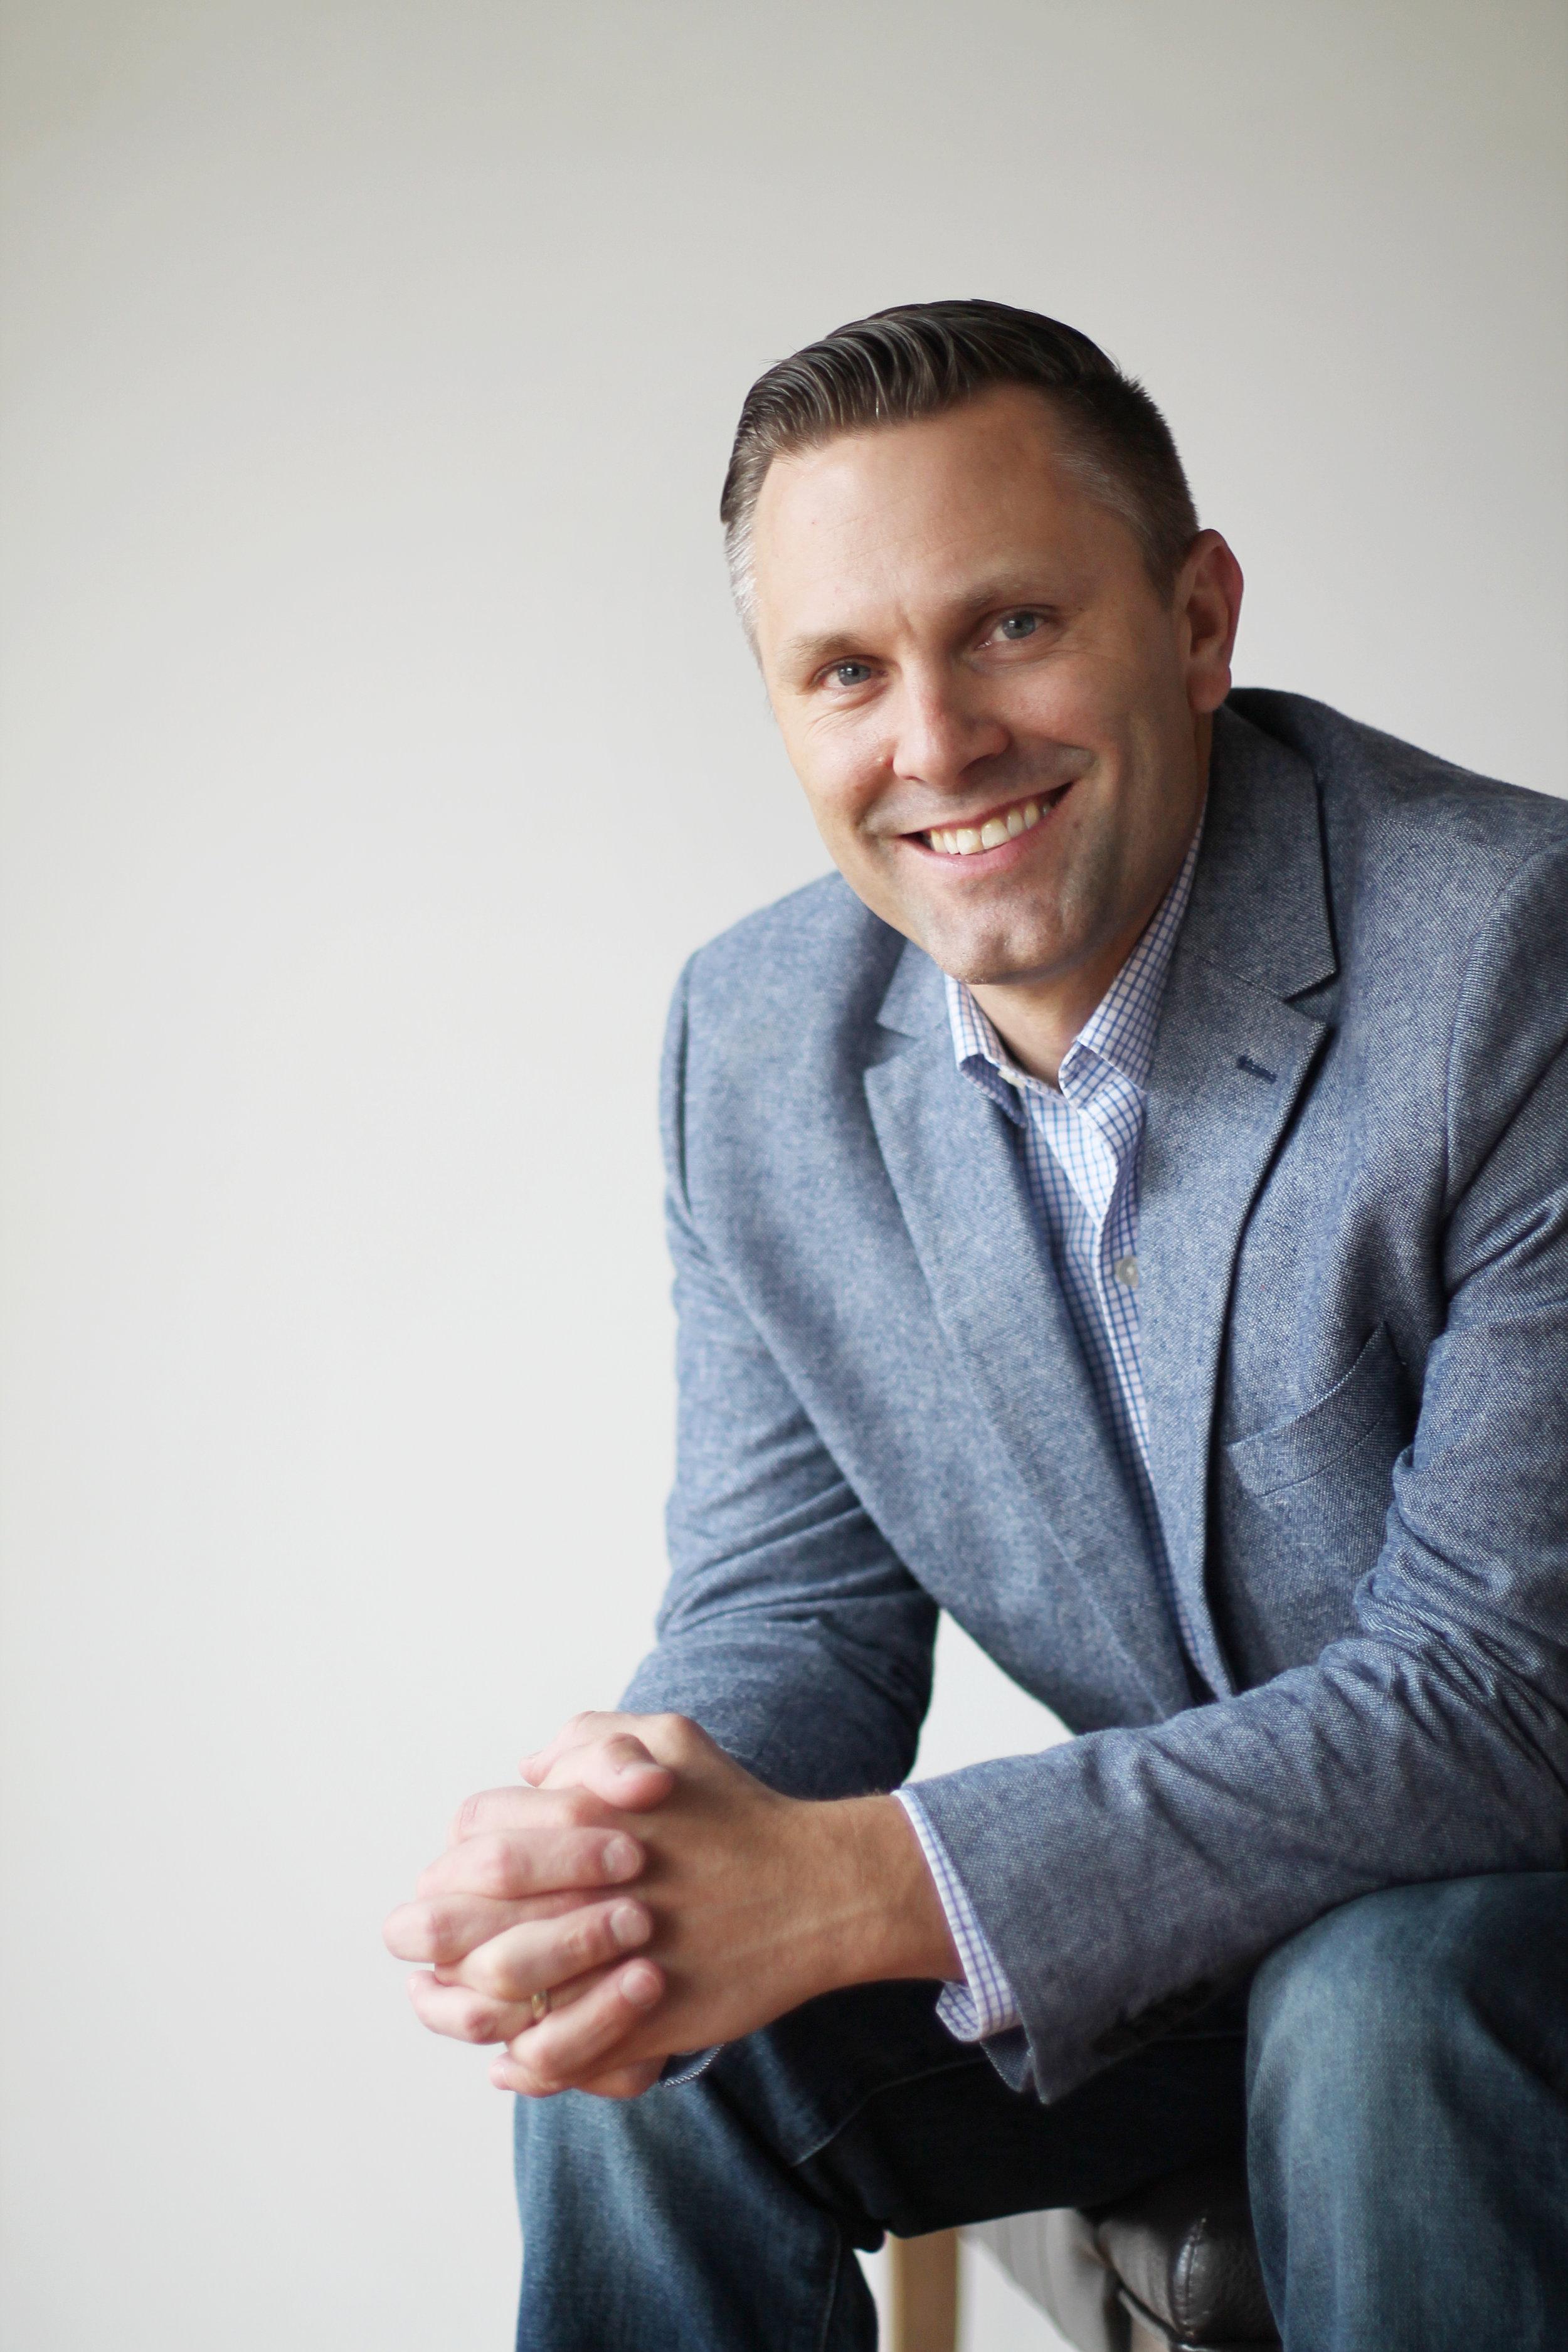 Austin B. Colby - Owner / Sr. Financial Planner